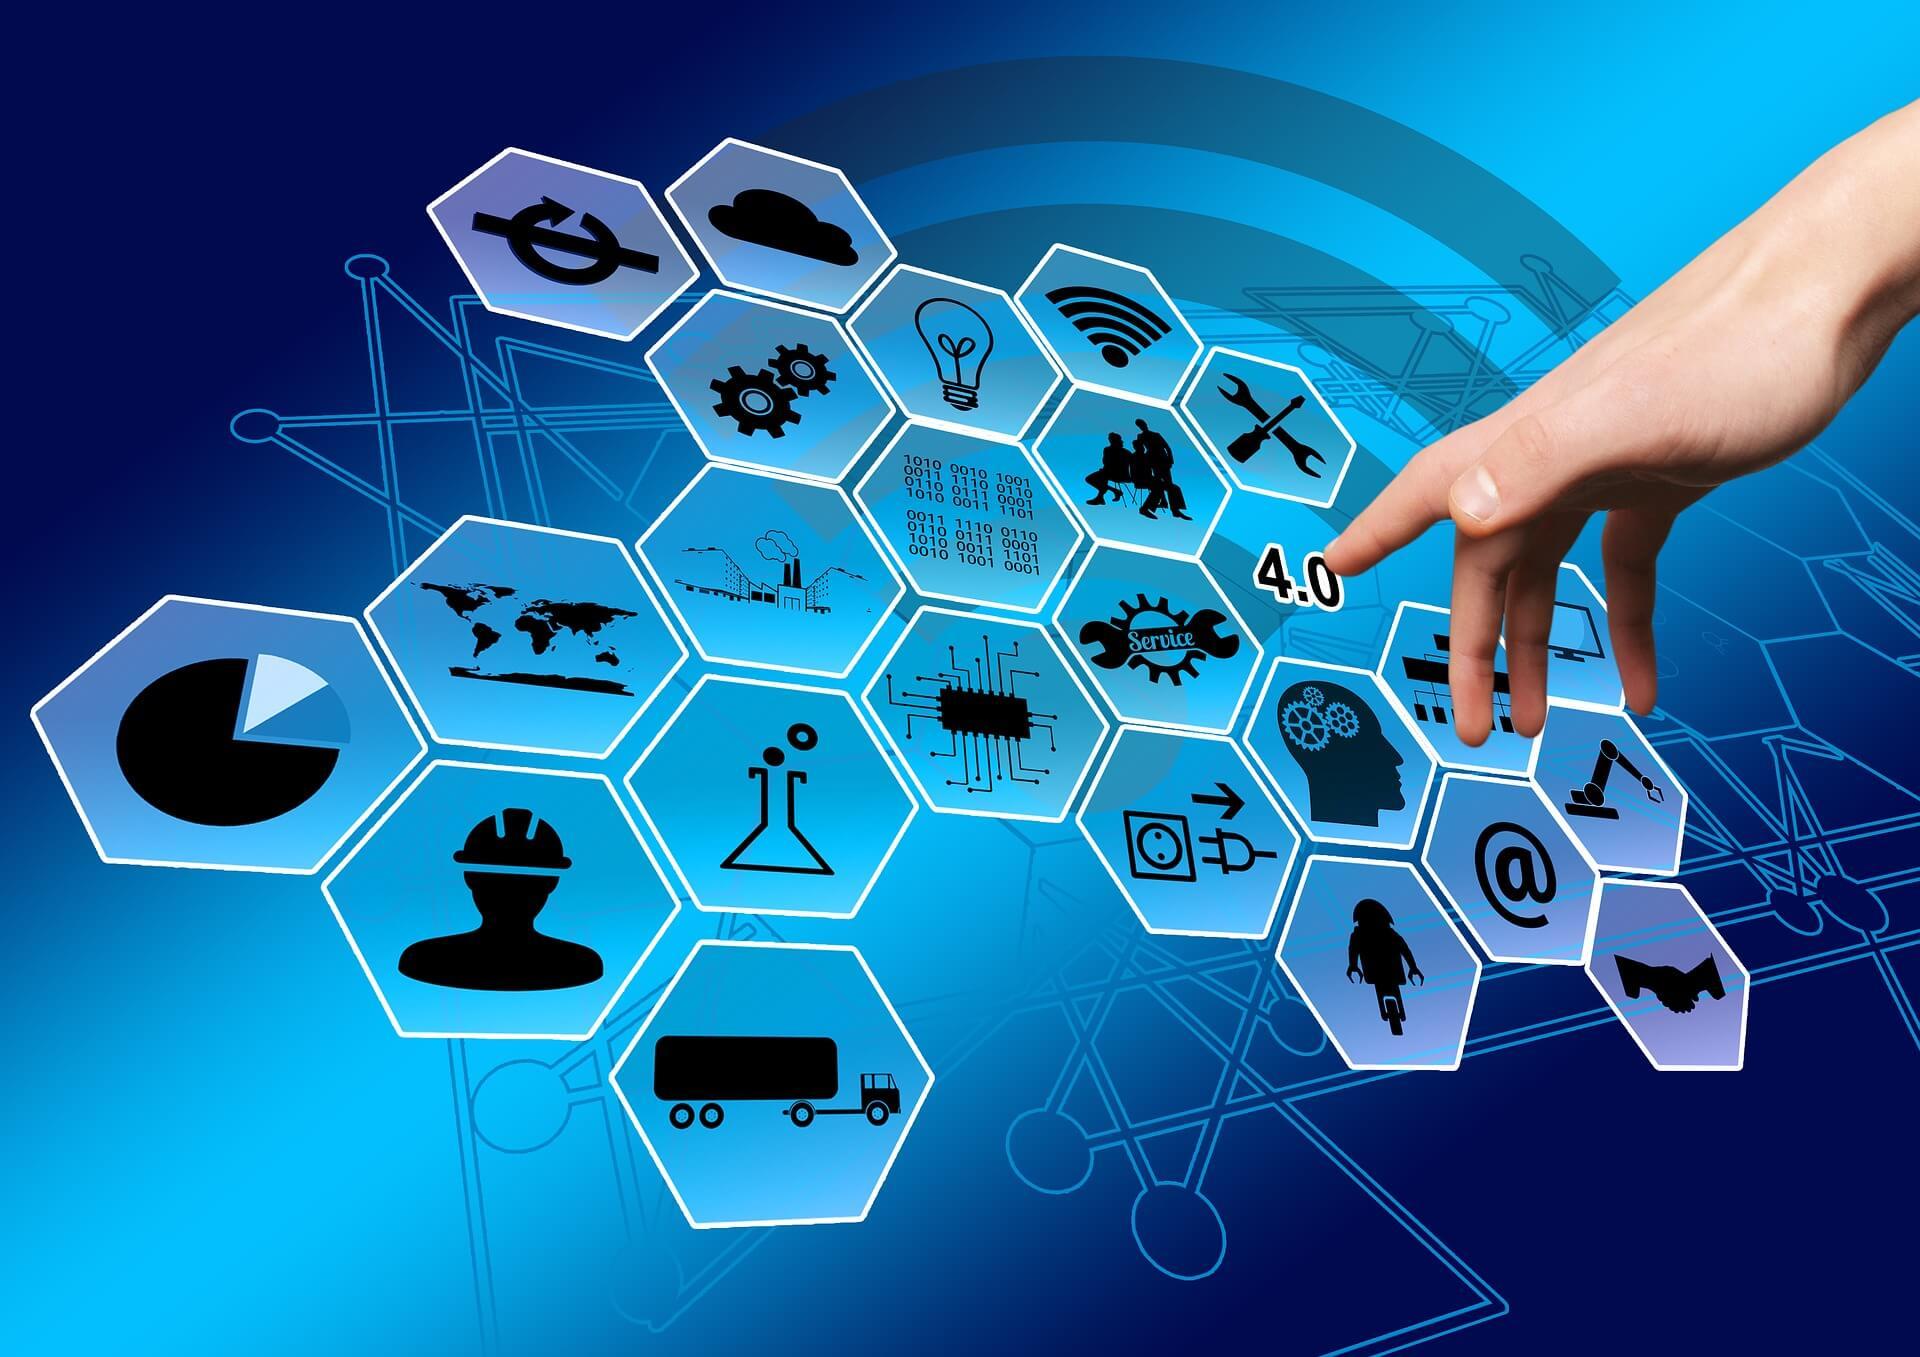 microinnovazione digitale toscana competence center made